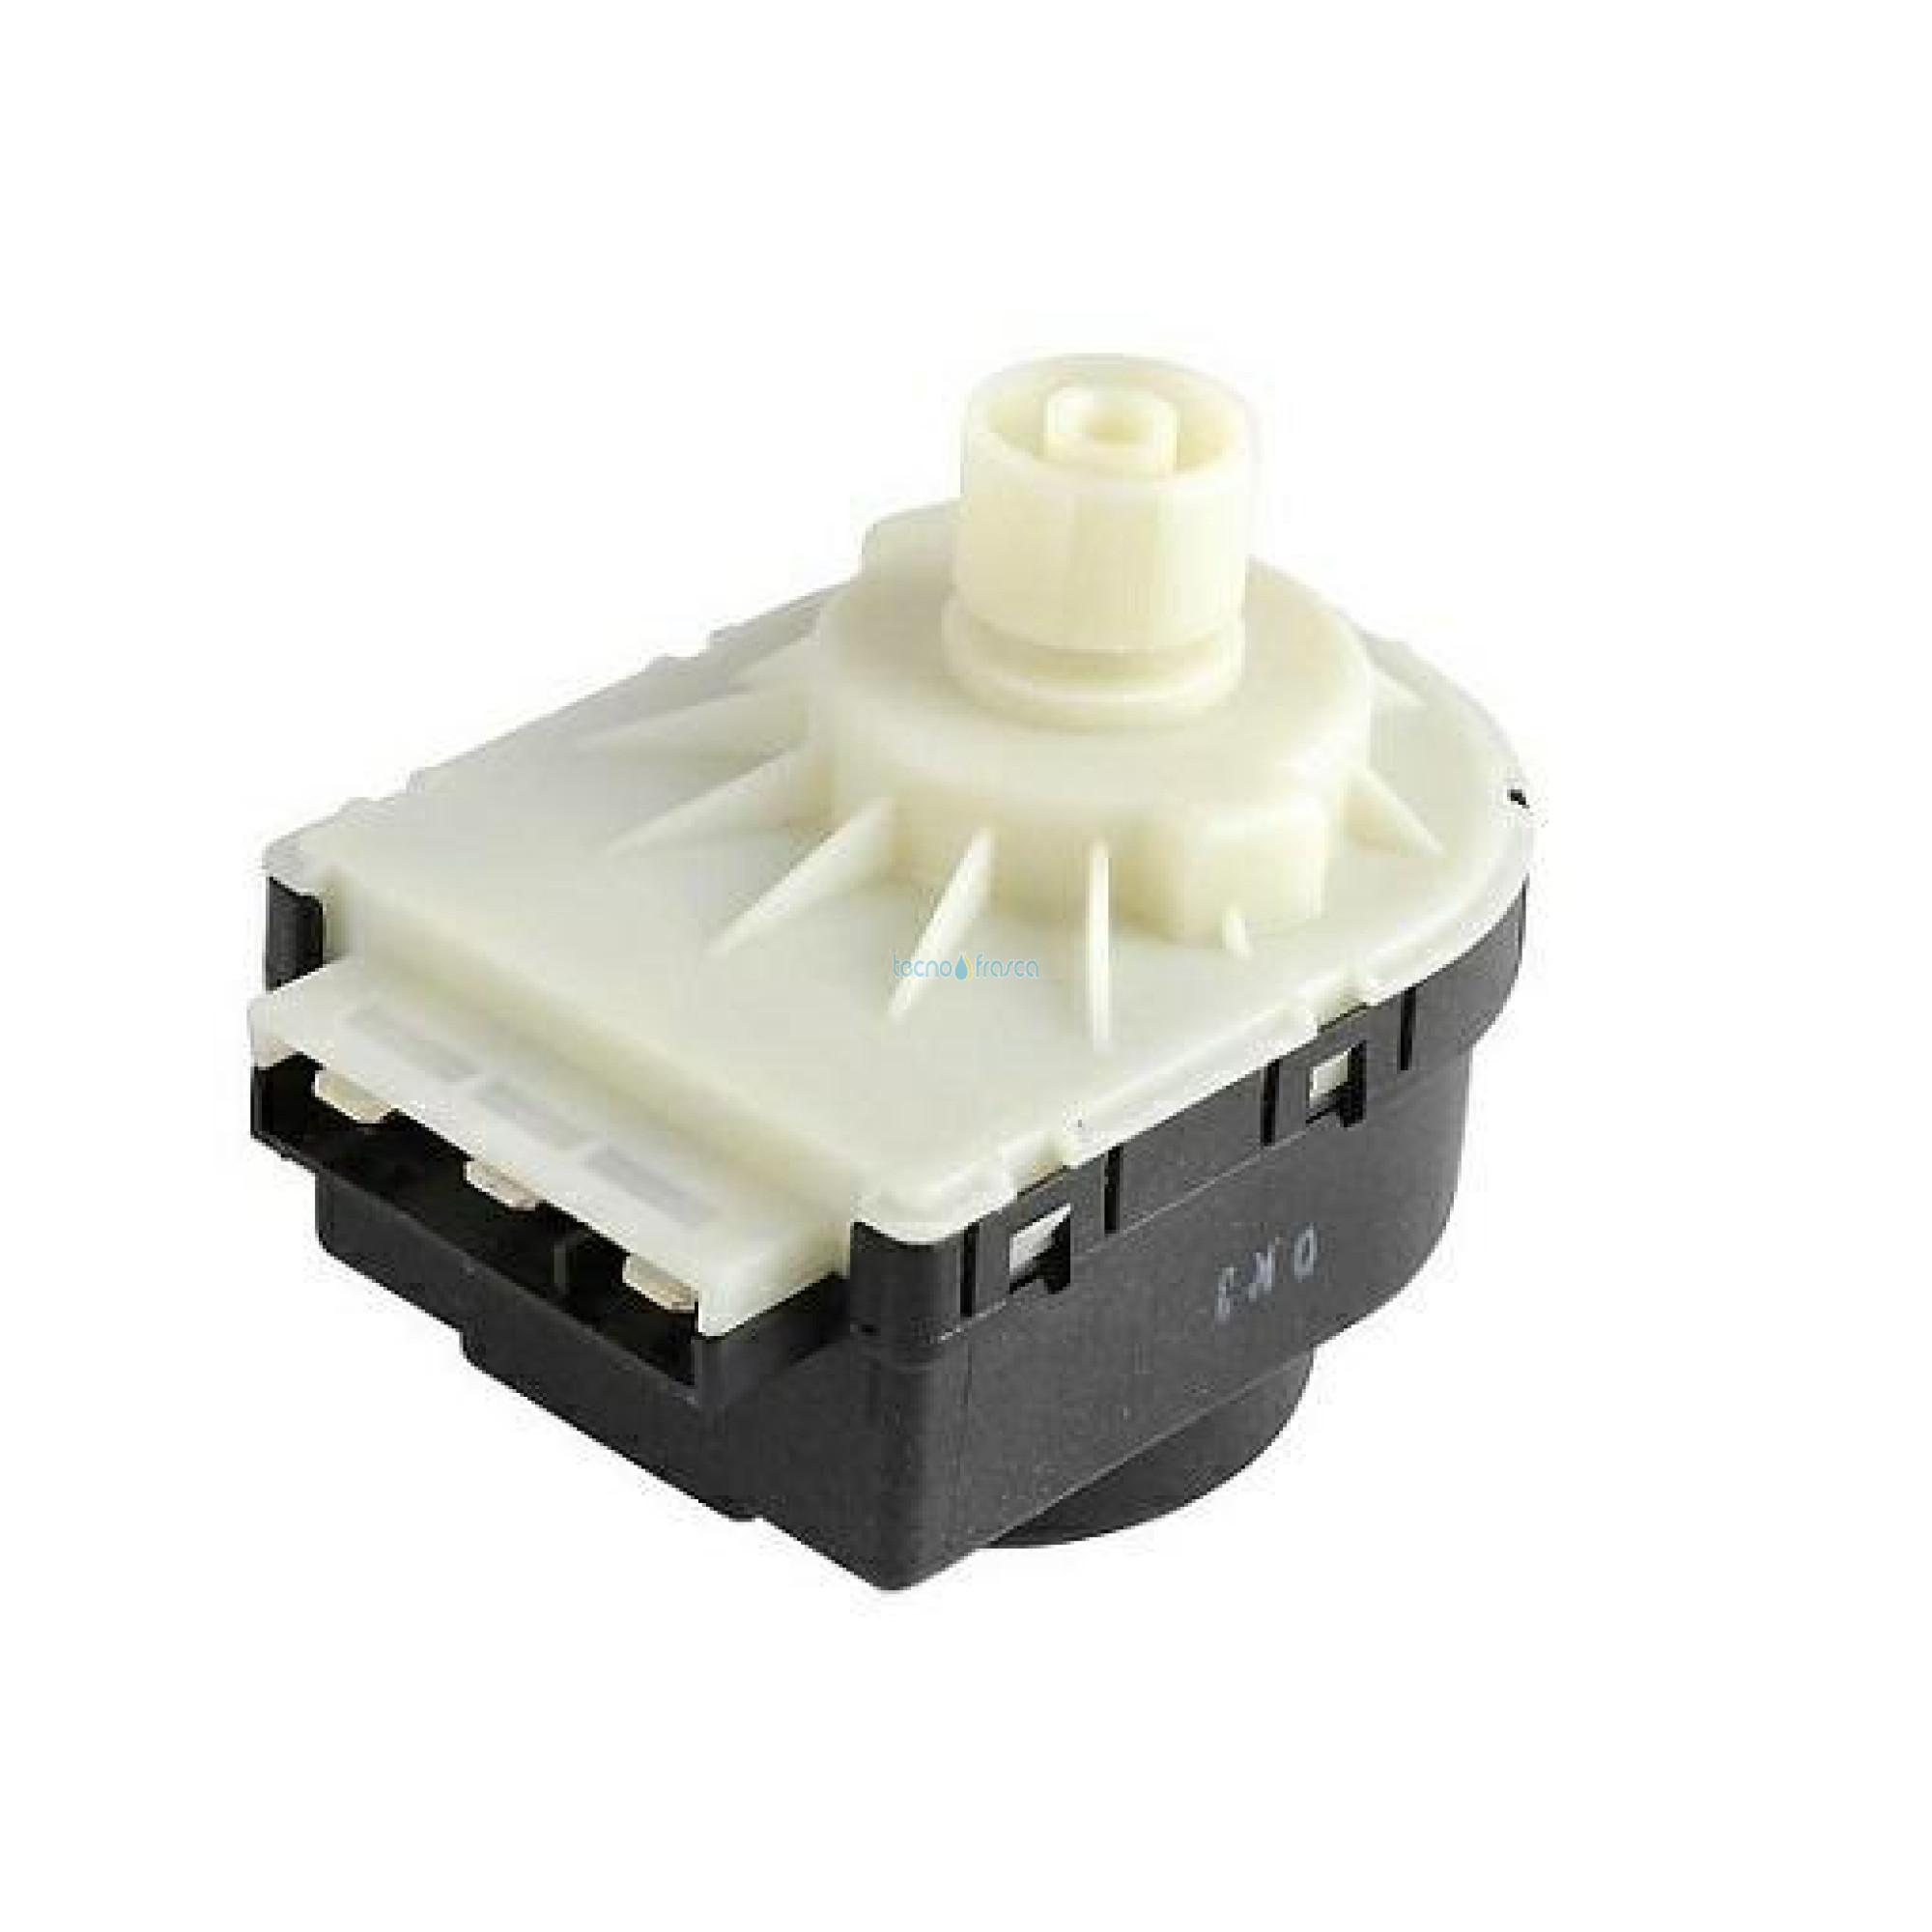 Chaffoteaux motore valvola 3vie 61302483-01